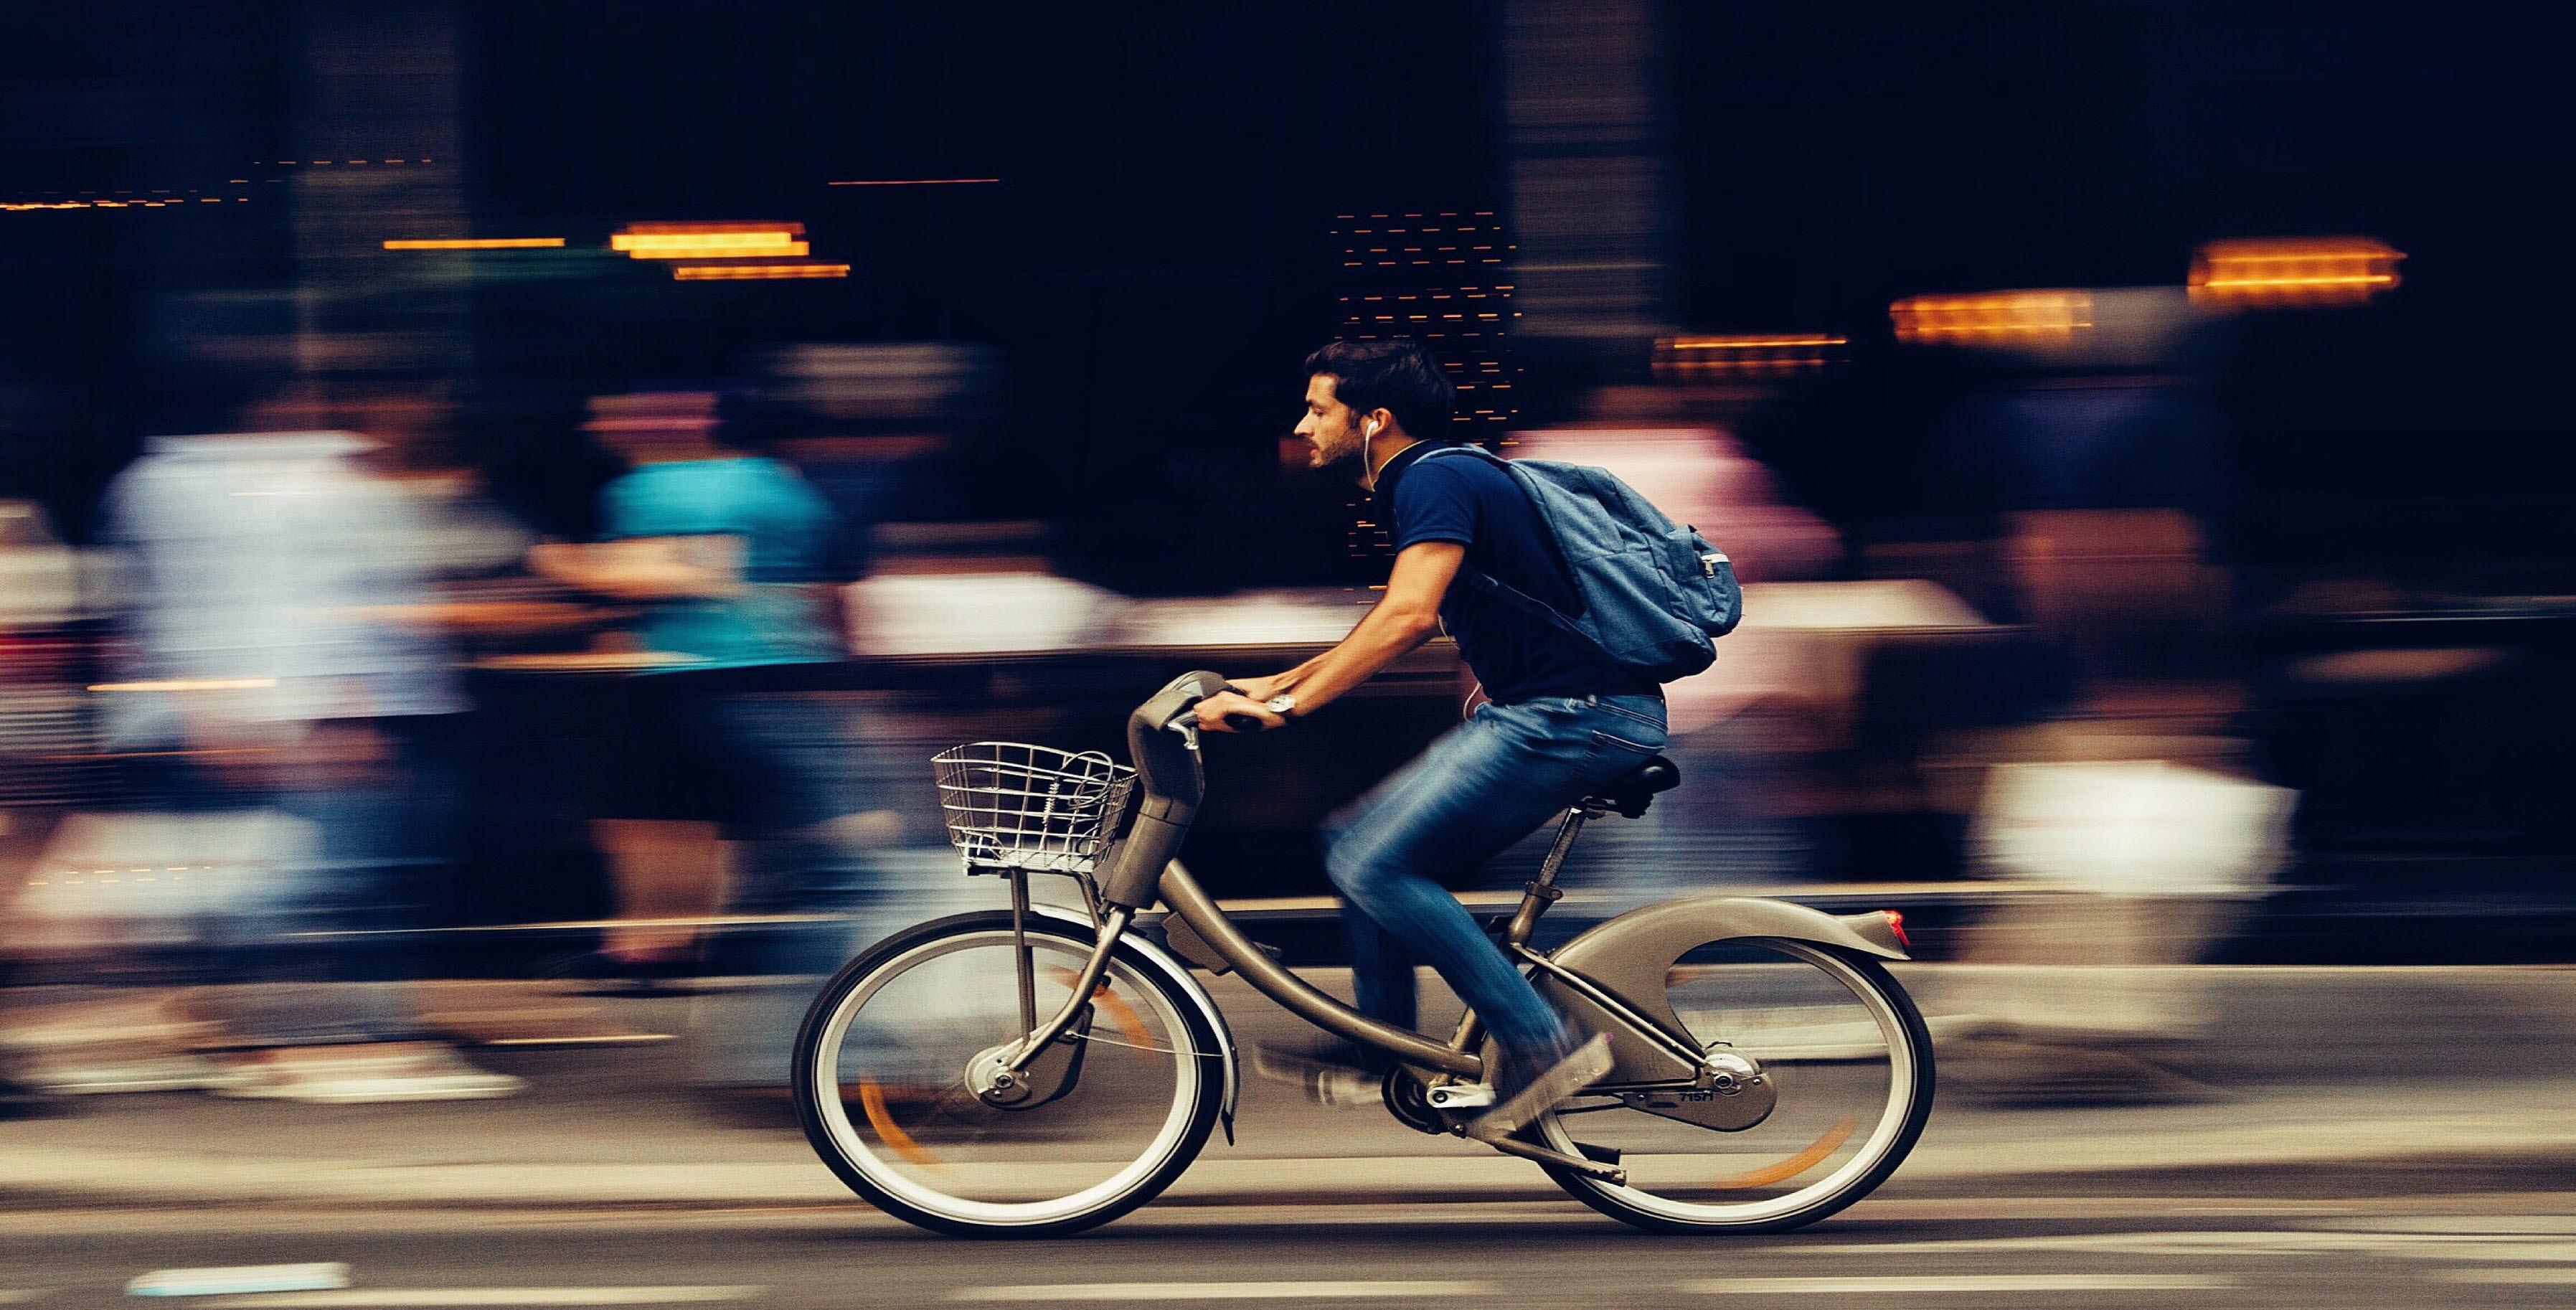 cyclist, commute, pexels, 140318, mb